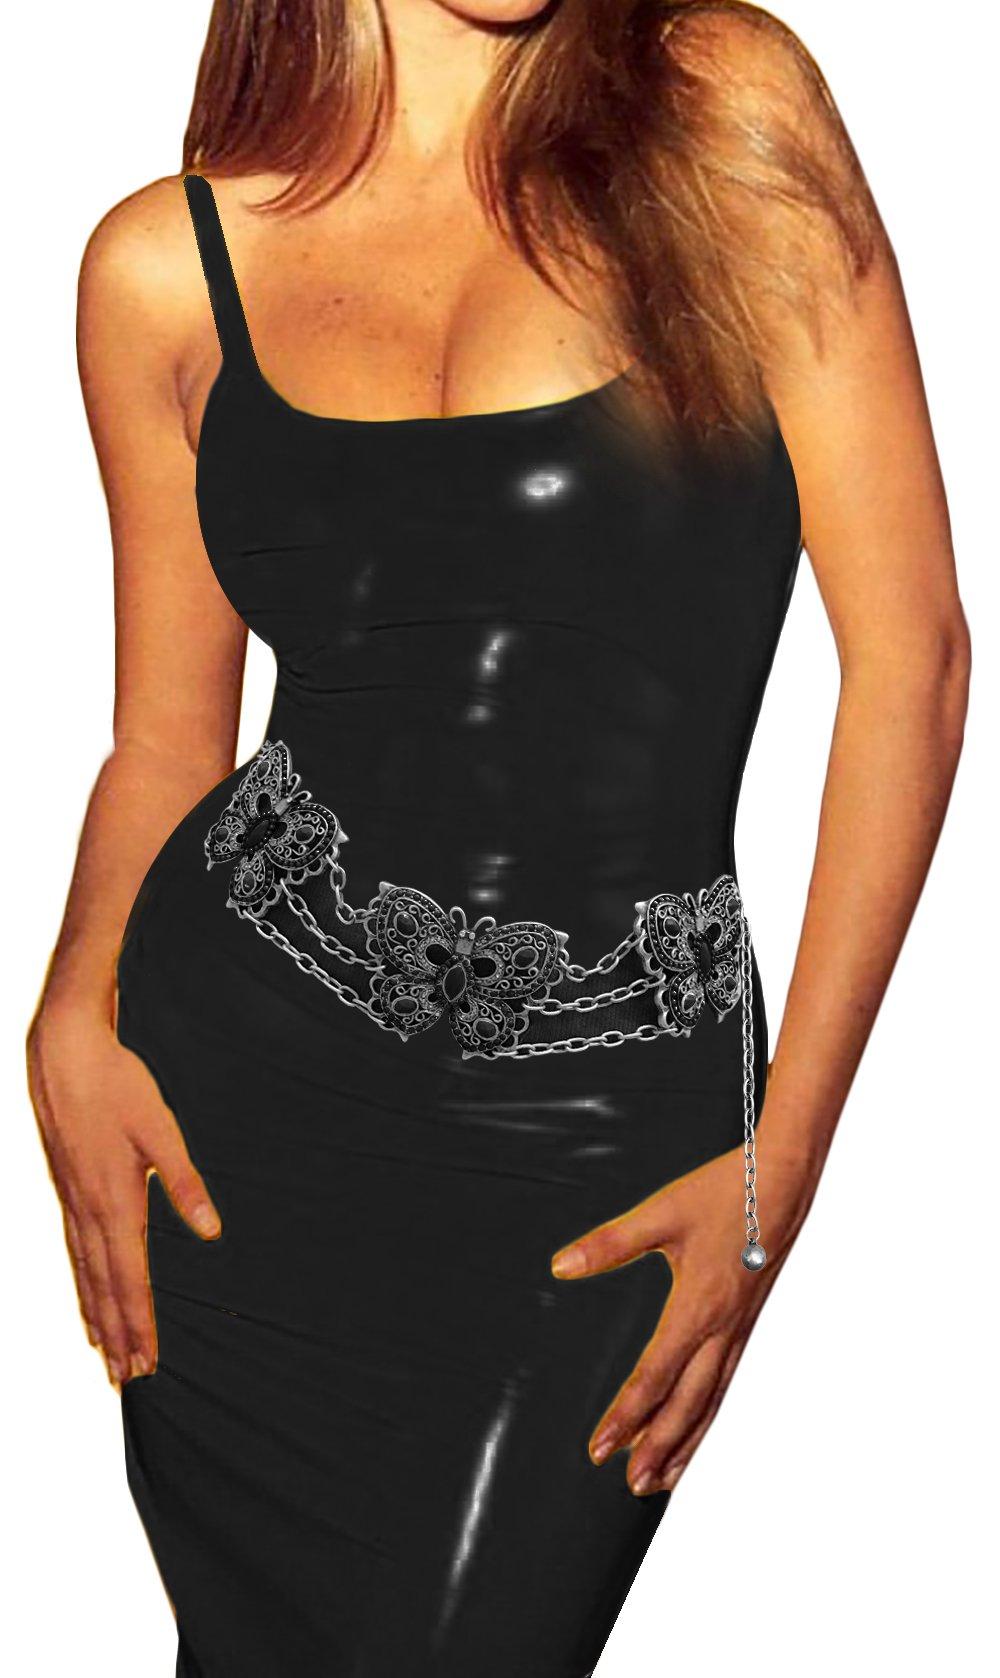 Luna Sosano Womens Rhodium Plated Fashion Antique Chain Belt - Type 50 - Black